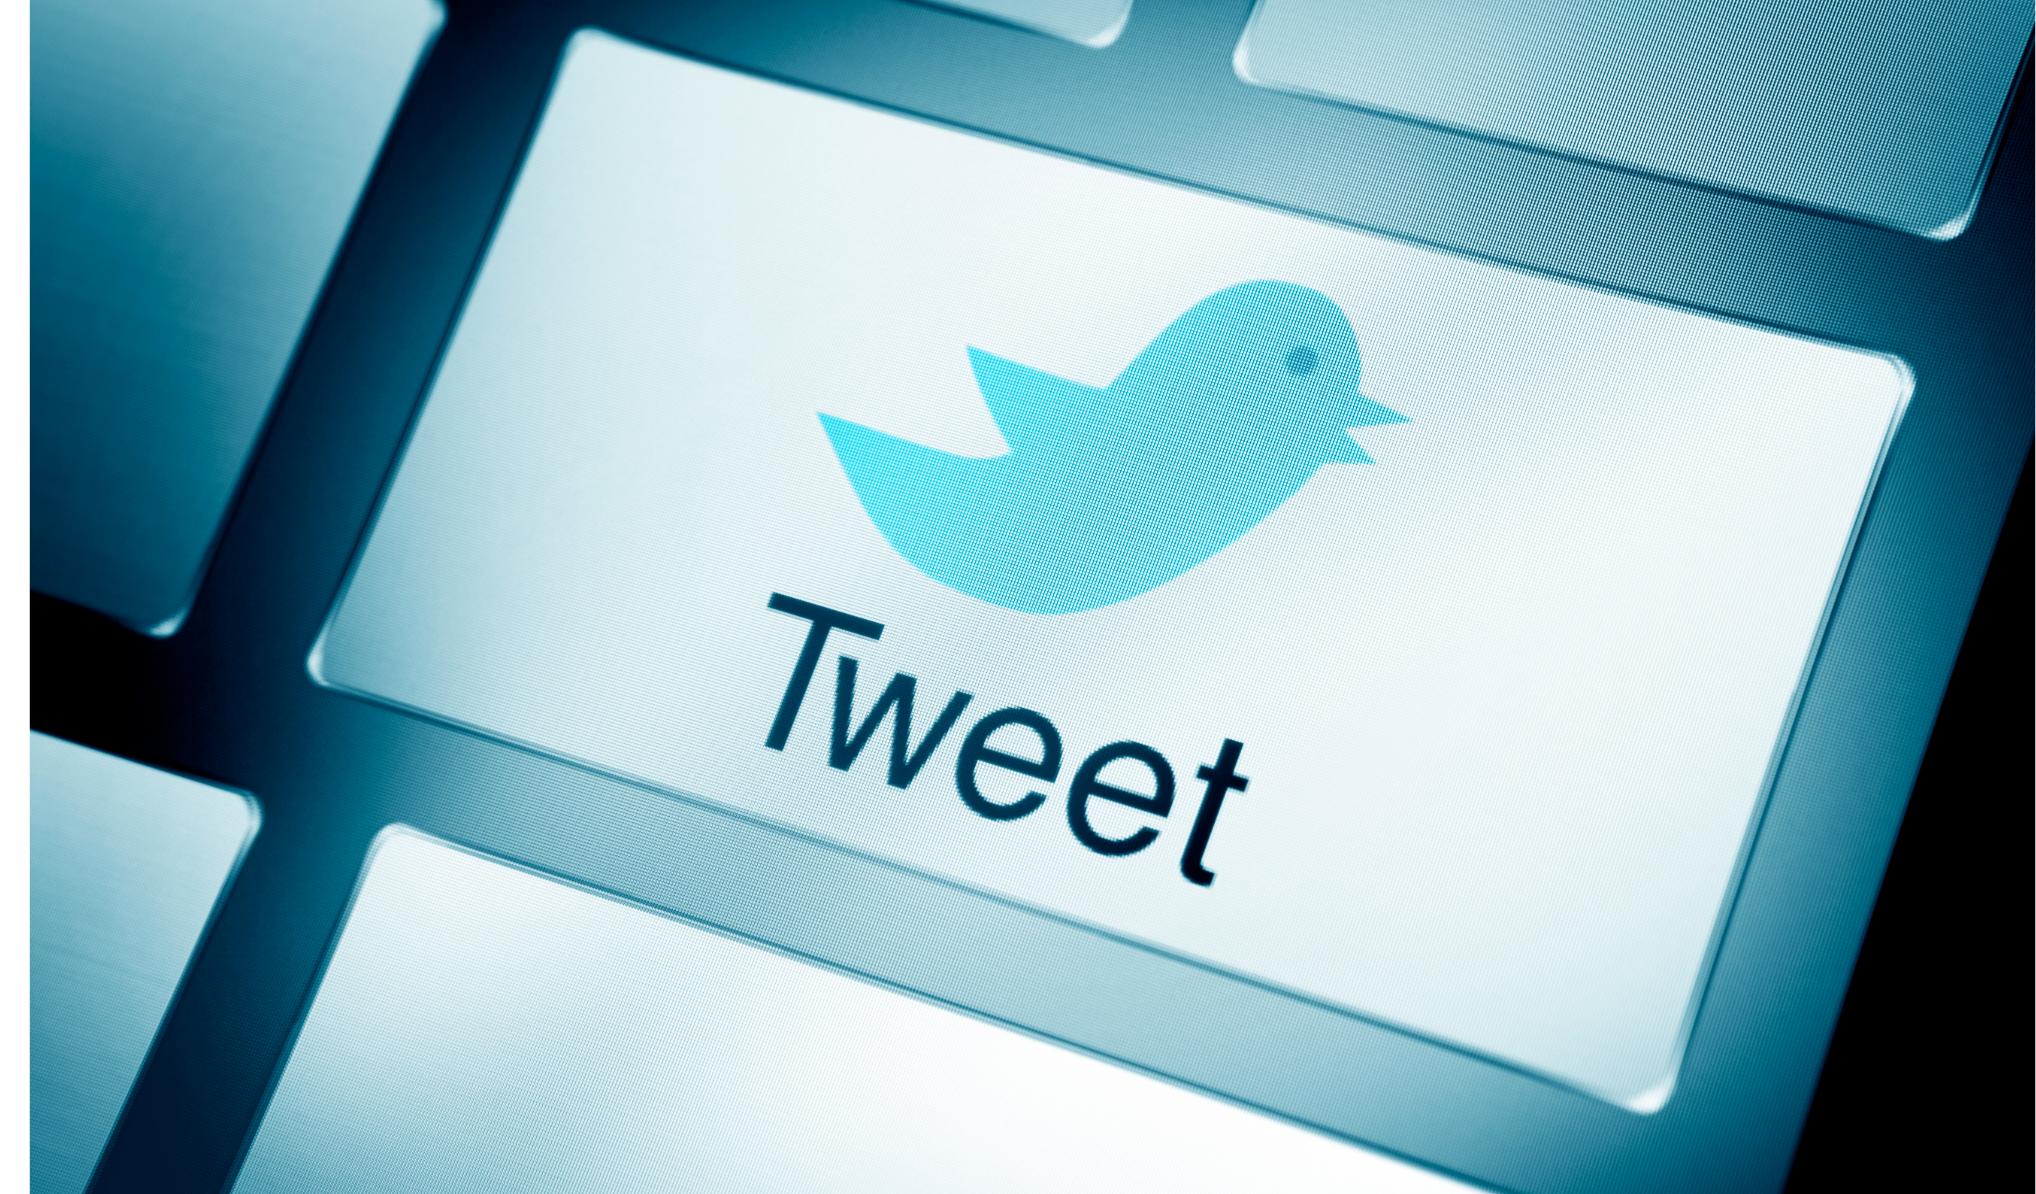 make your tweets more engaging - legendary social media